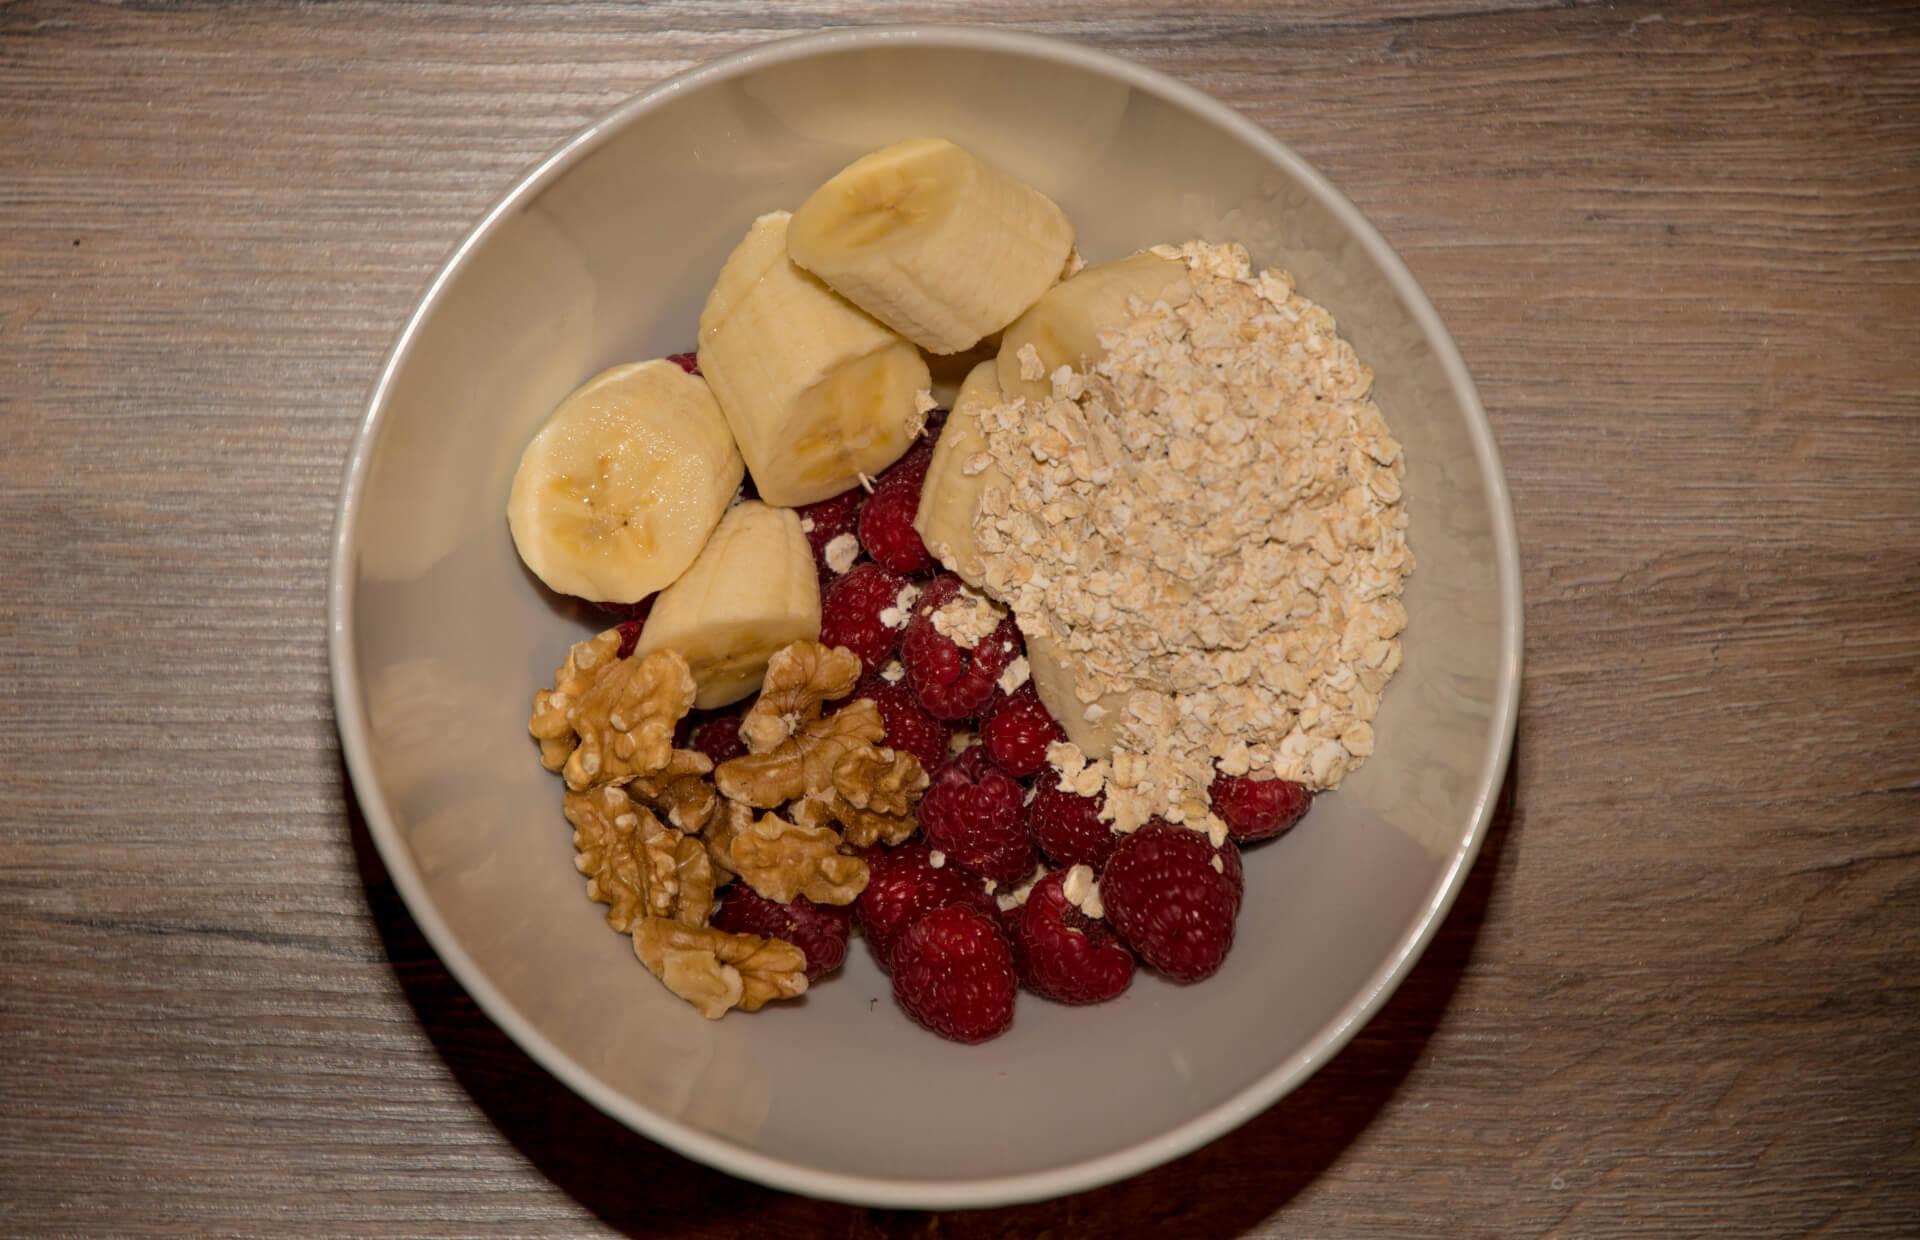 FEFLOGX Sportswear gesundes Frühstücks-Müsli.